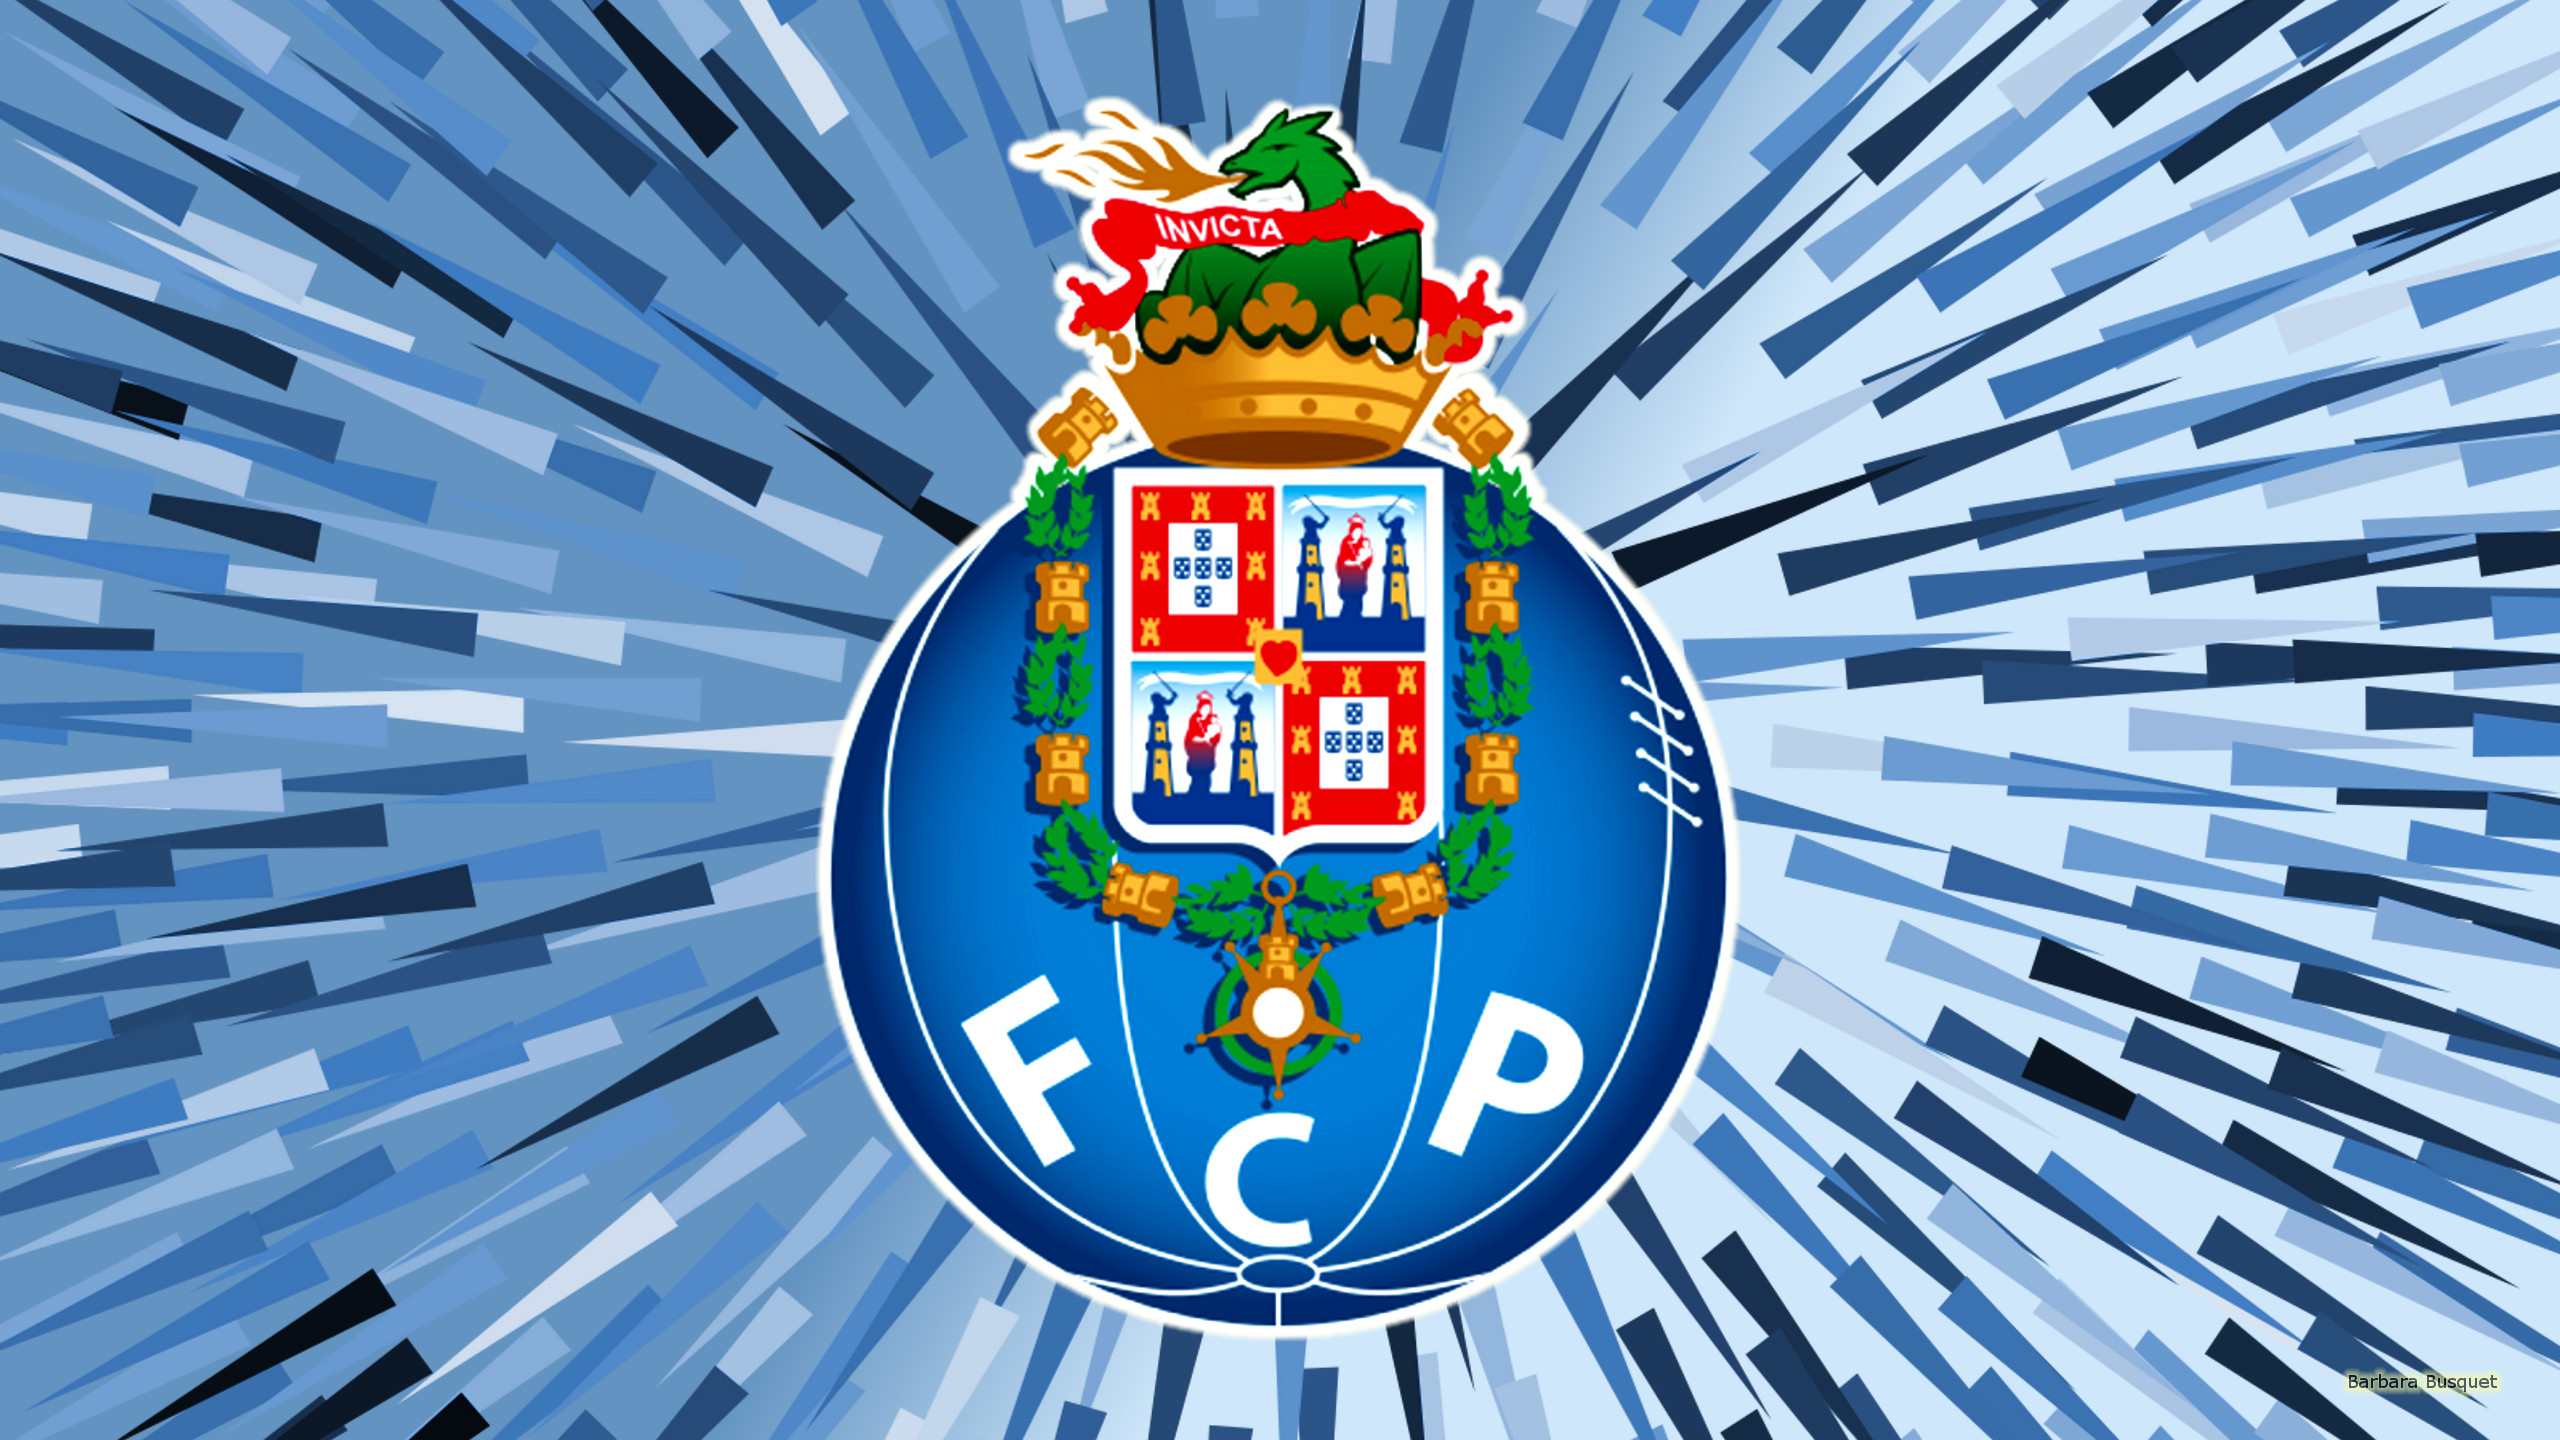 FC Porto HD Wallpaper Background Image 2560x1440 ID989444 2560x1440